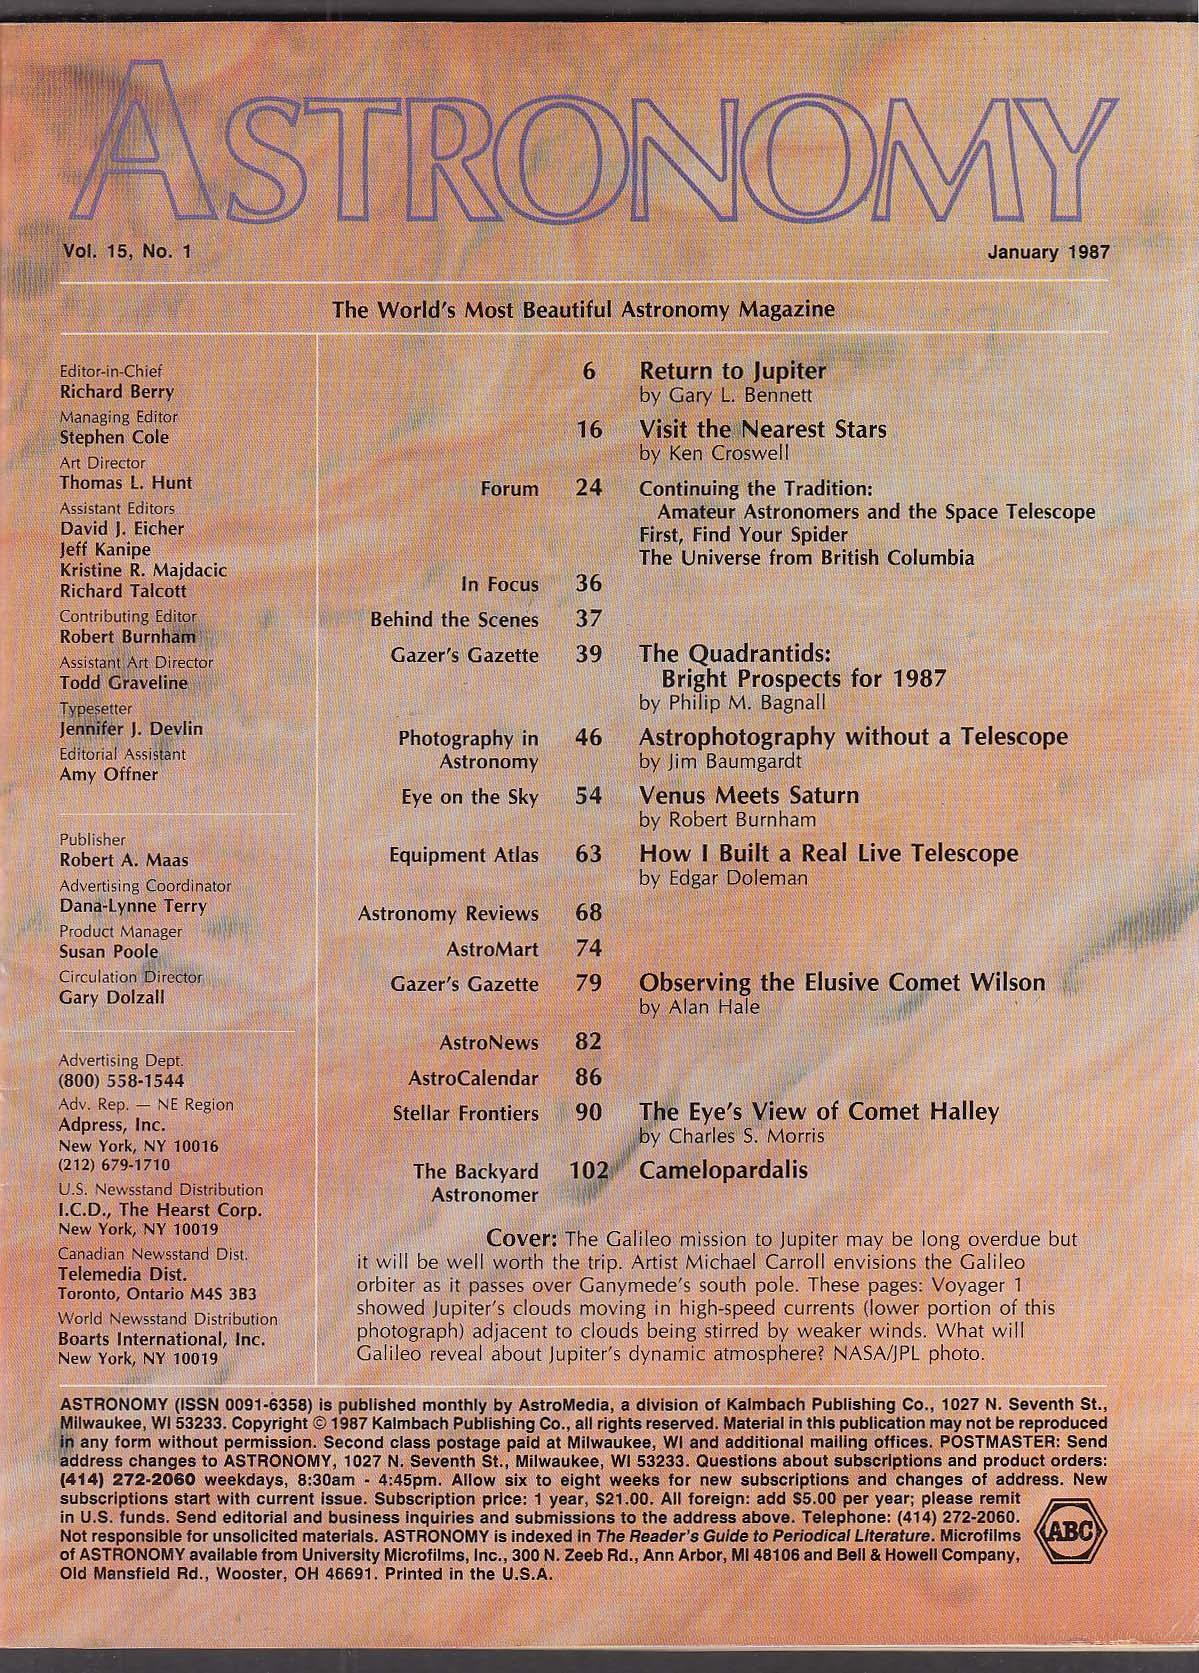 ASTRONOMY Comet Wilson Halley Jupiter Galileo Quadrantids Camelopardalis 1 1987